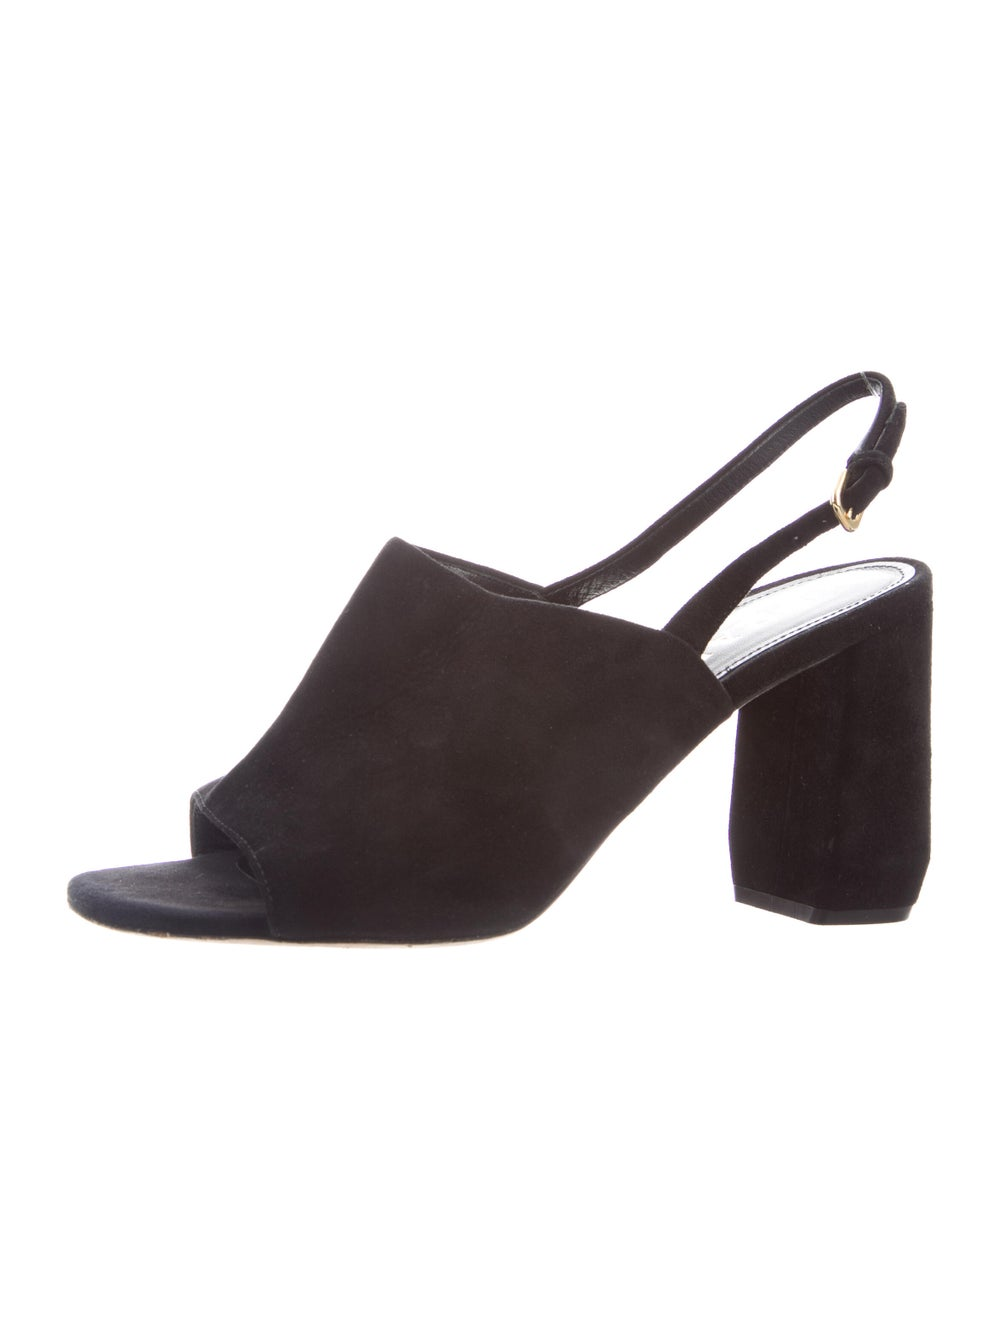 Prada Suede Slingback Sandals Black - image 2